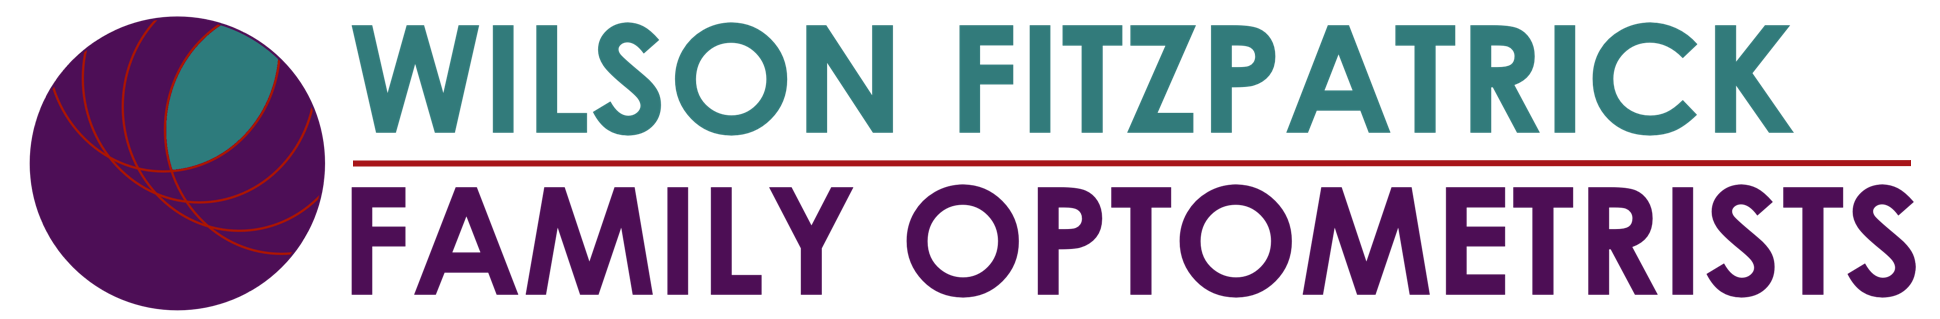 logo for Wilson Fitzpatrick Family Optometrists Optometrists